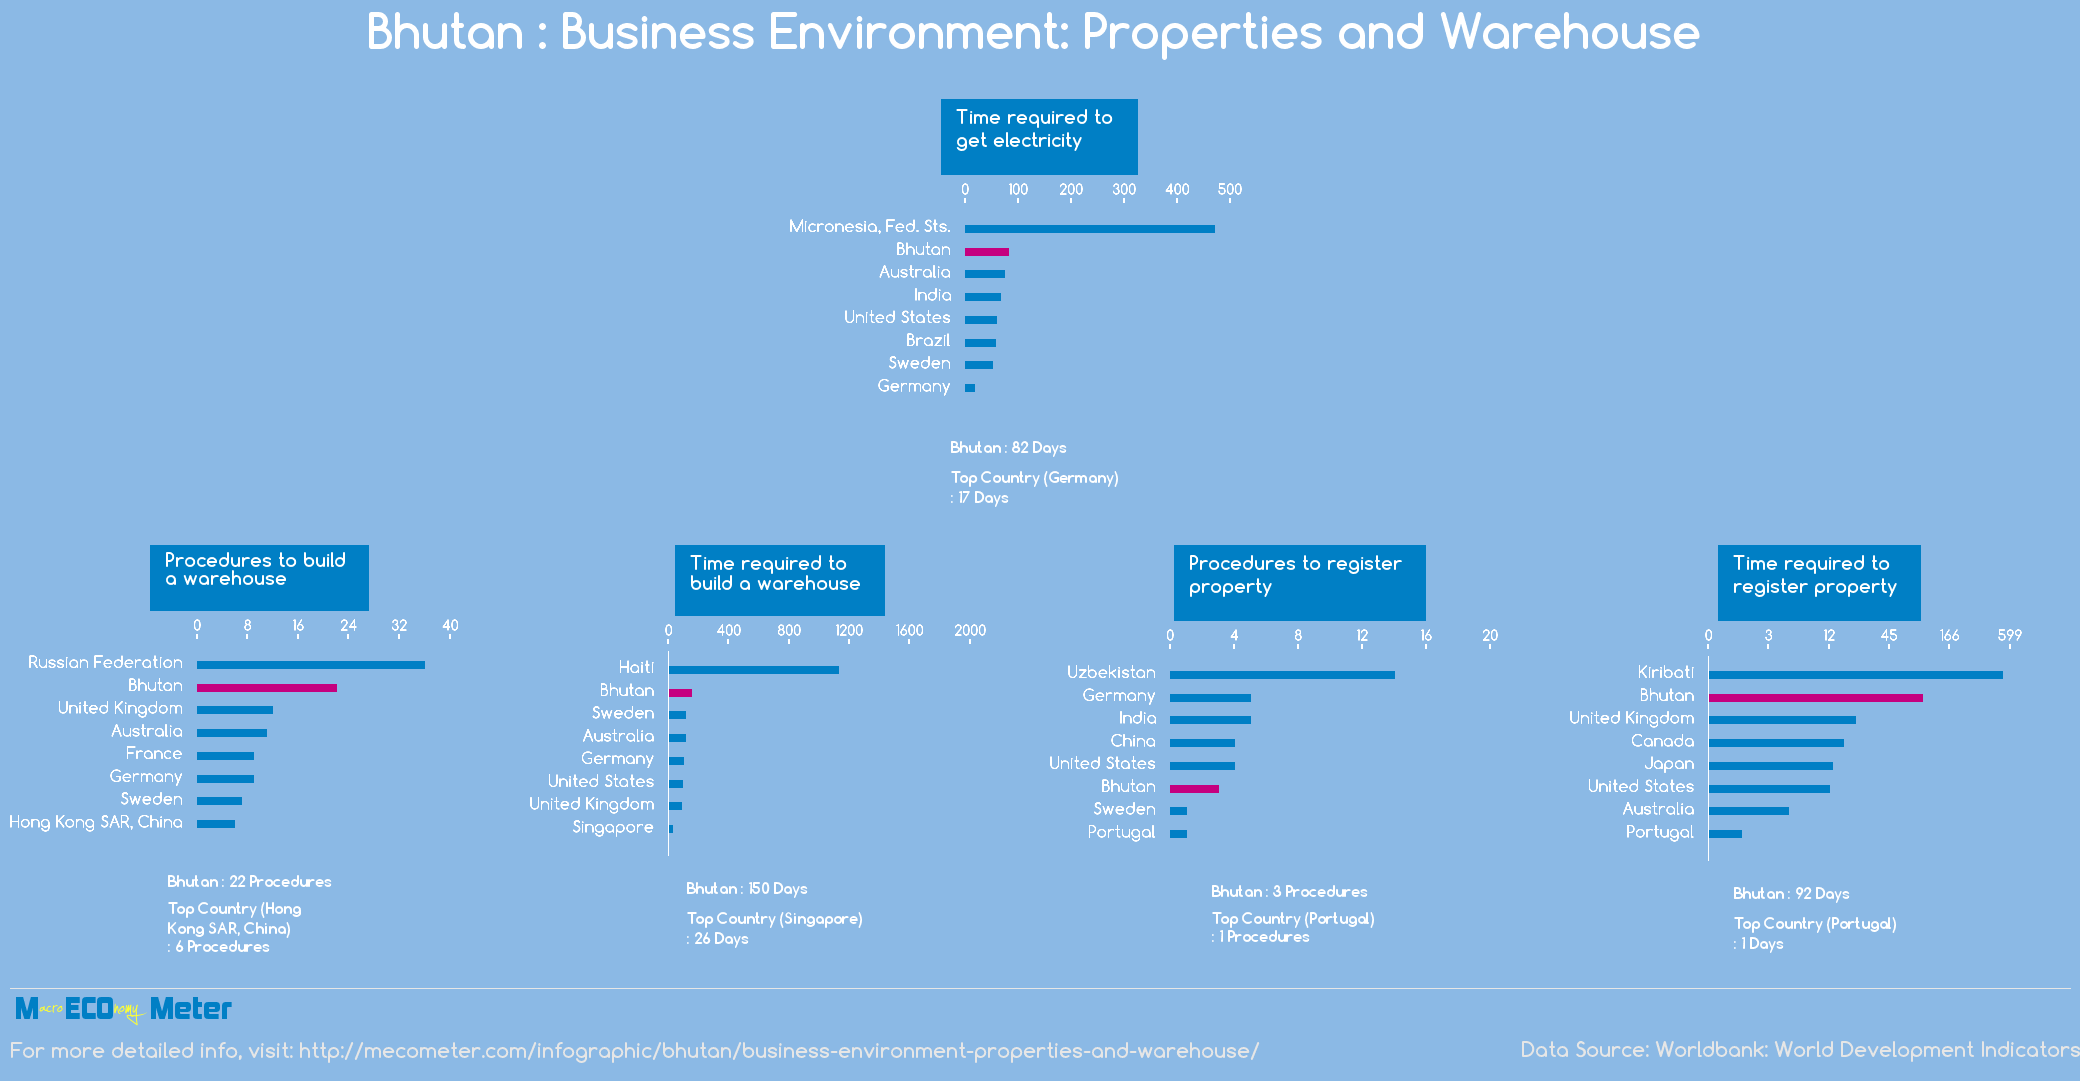 Bhutan : Business Environment: Properties and Warehouse